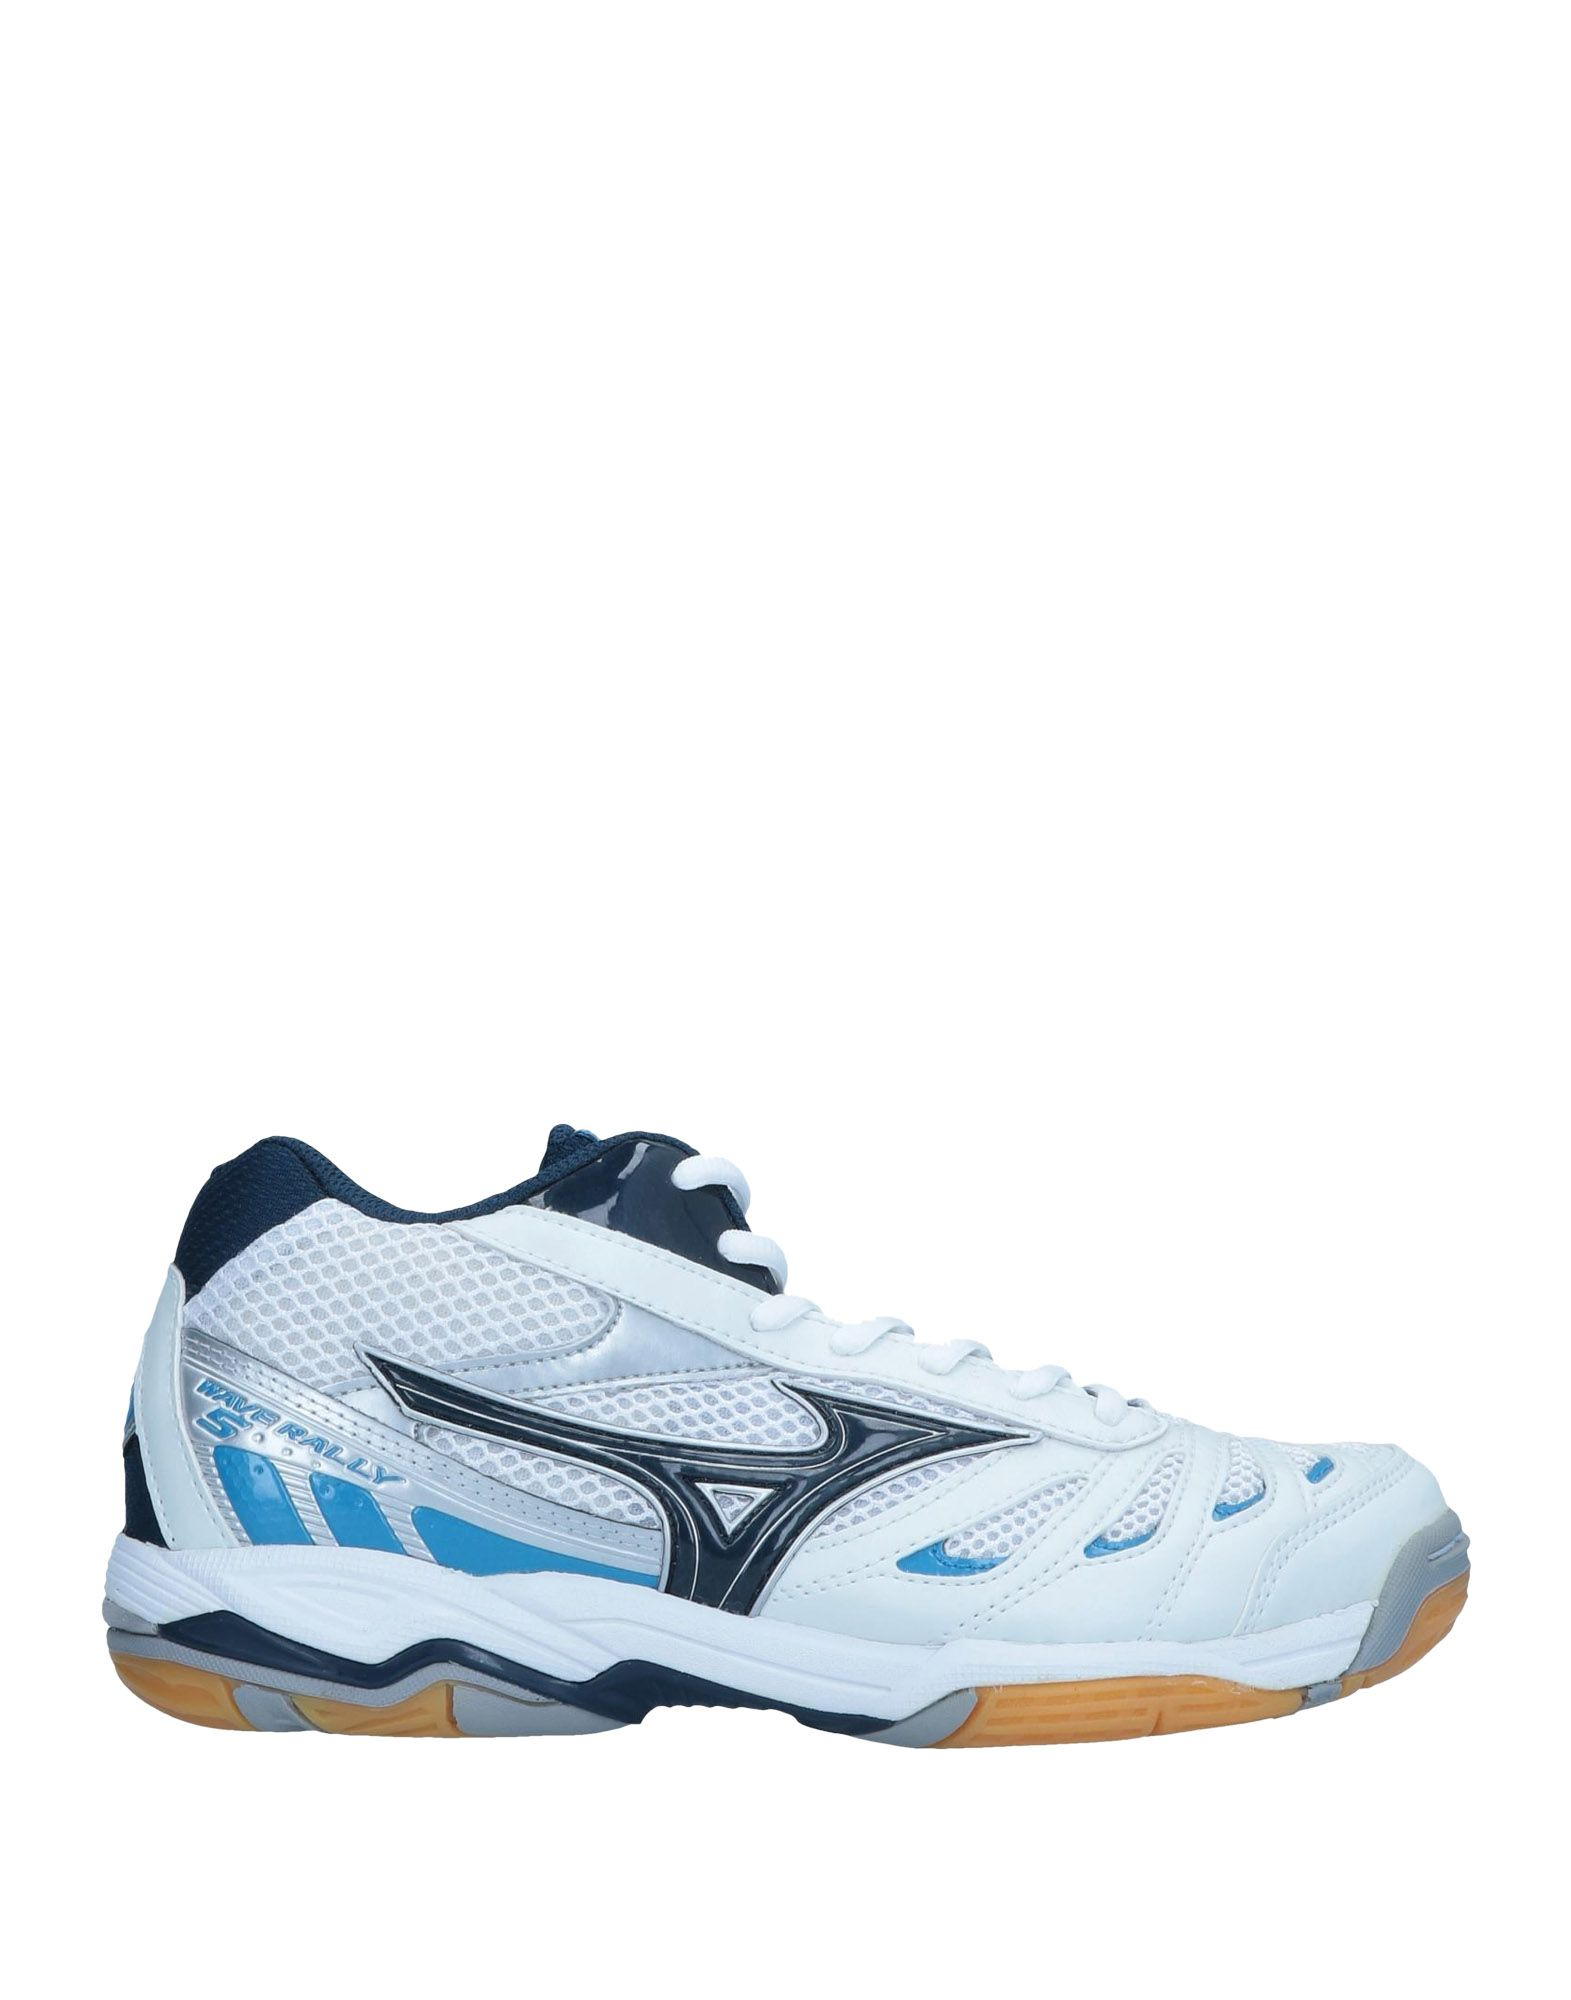 Mizuno Sneakers Damen  11546013QB Gute Qualität beliebte Schuhe